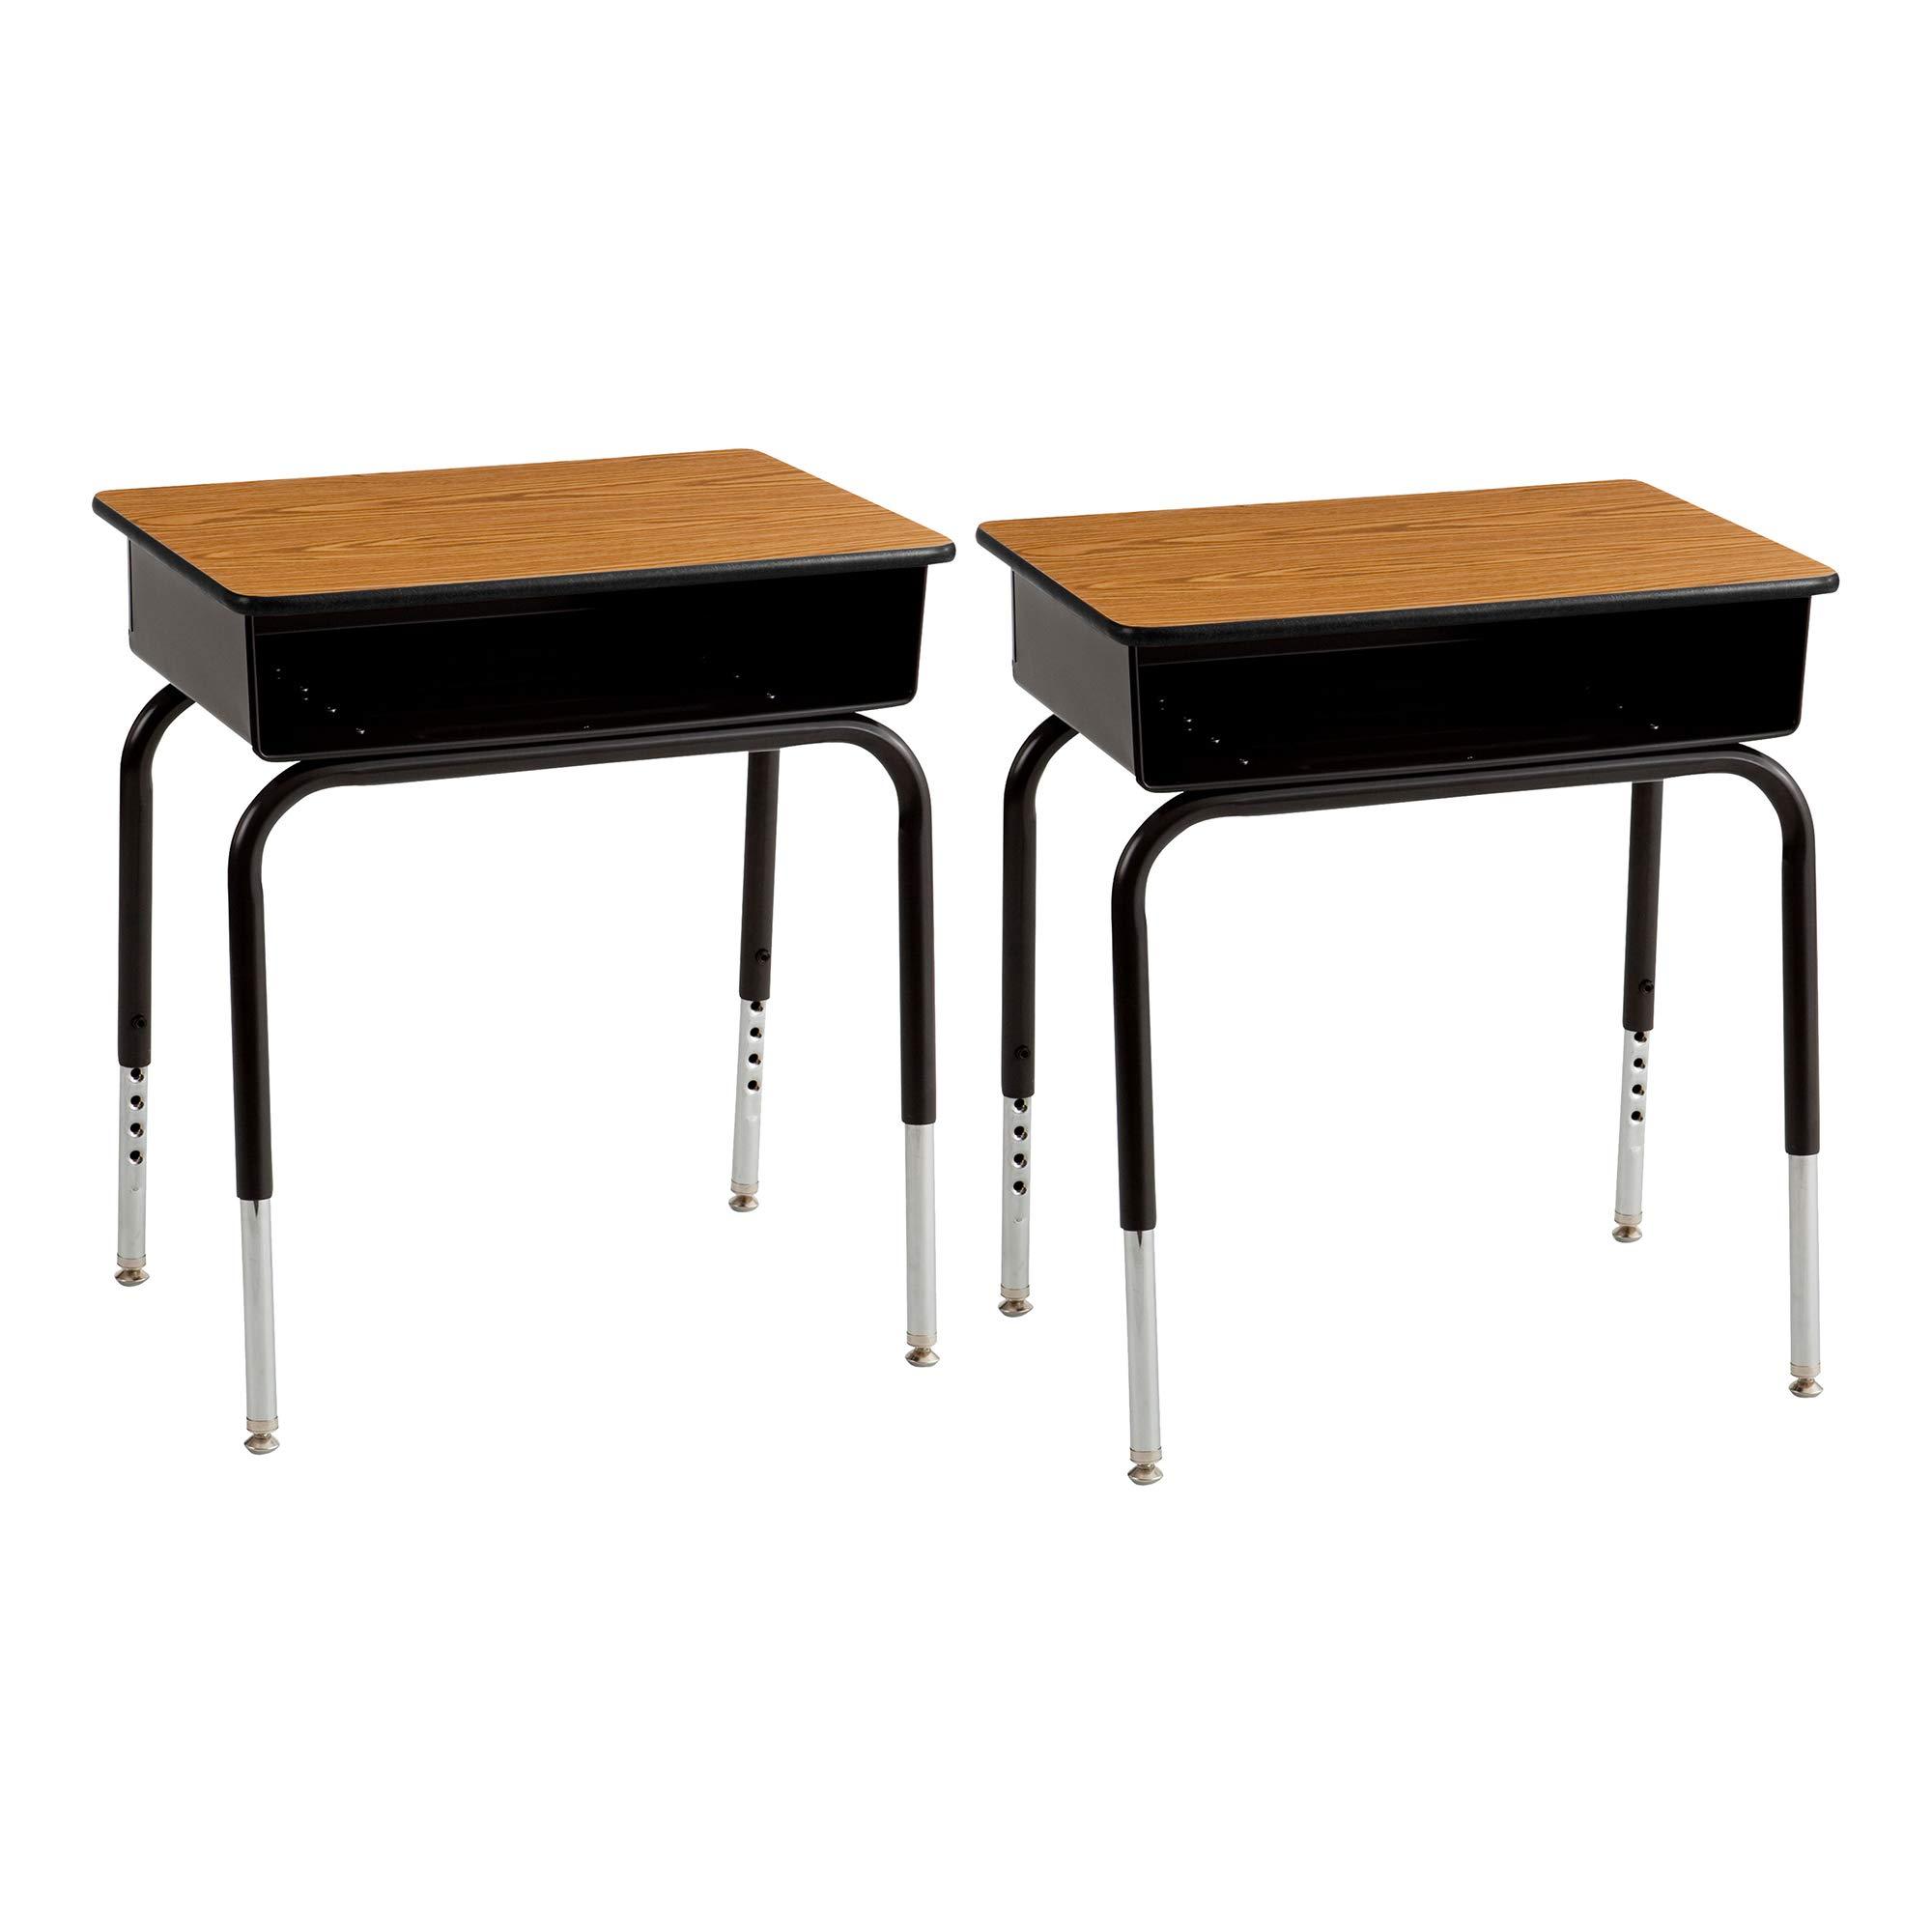 Fat Catalog ALT-24101 Adjustable-Height Open Front School Desk w/ Metal Bookbox - Oak/ Black (Pack of 2) by Fat Catalog